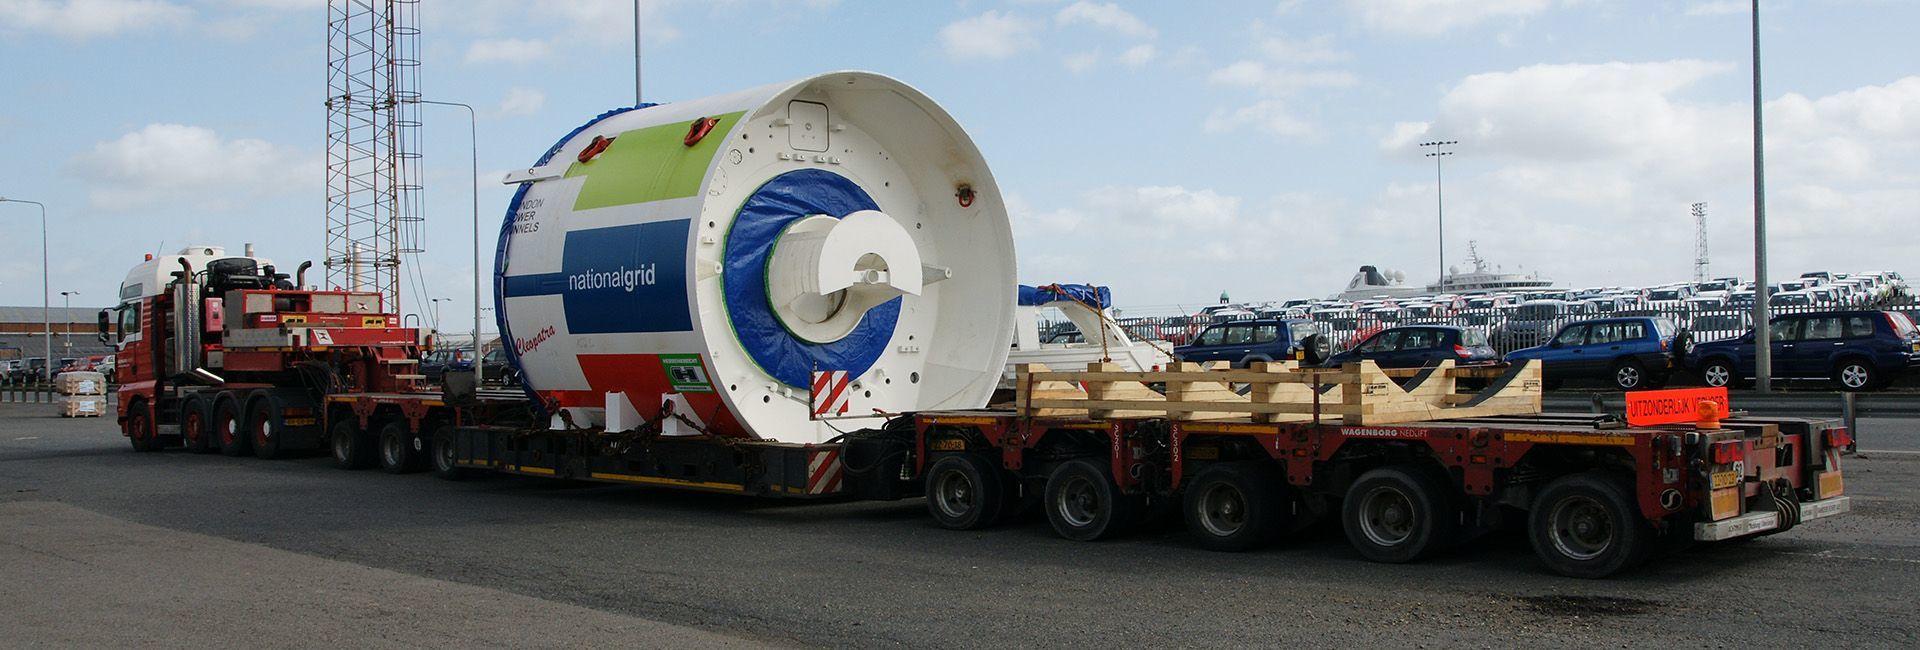 National Grid London Tunnel Boring Machine